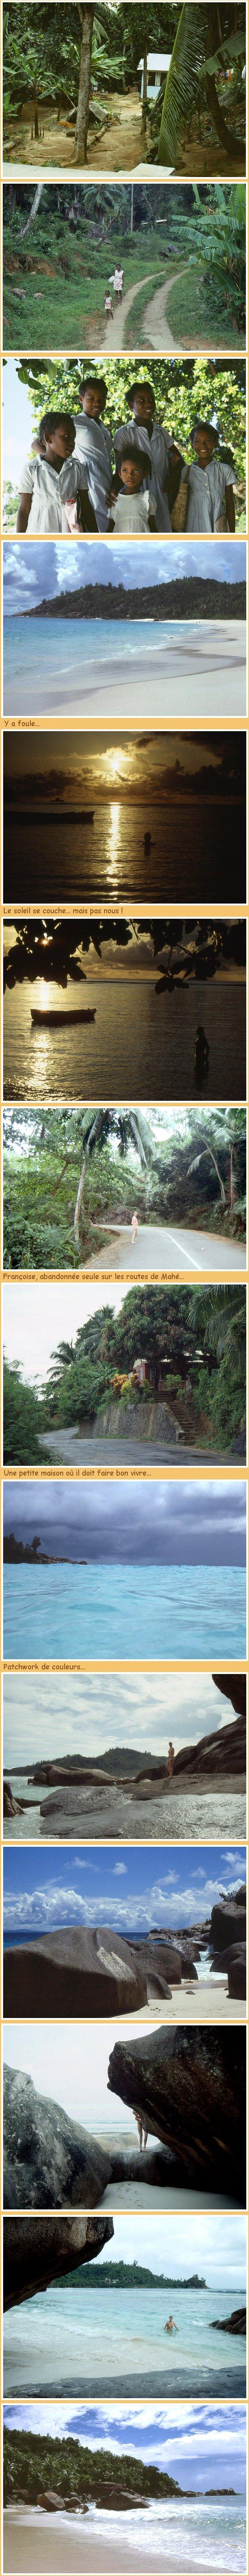 Les Seychelles - 2